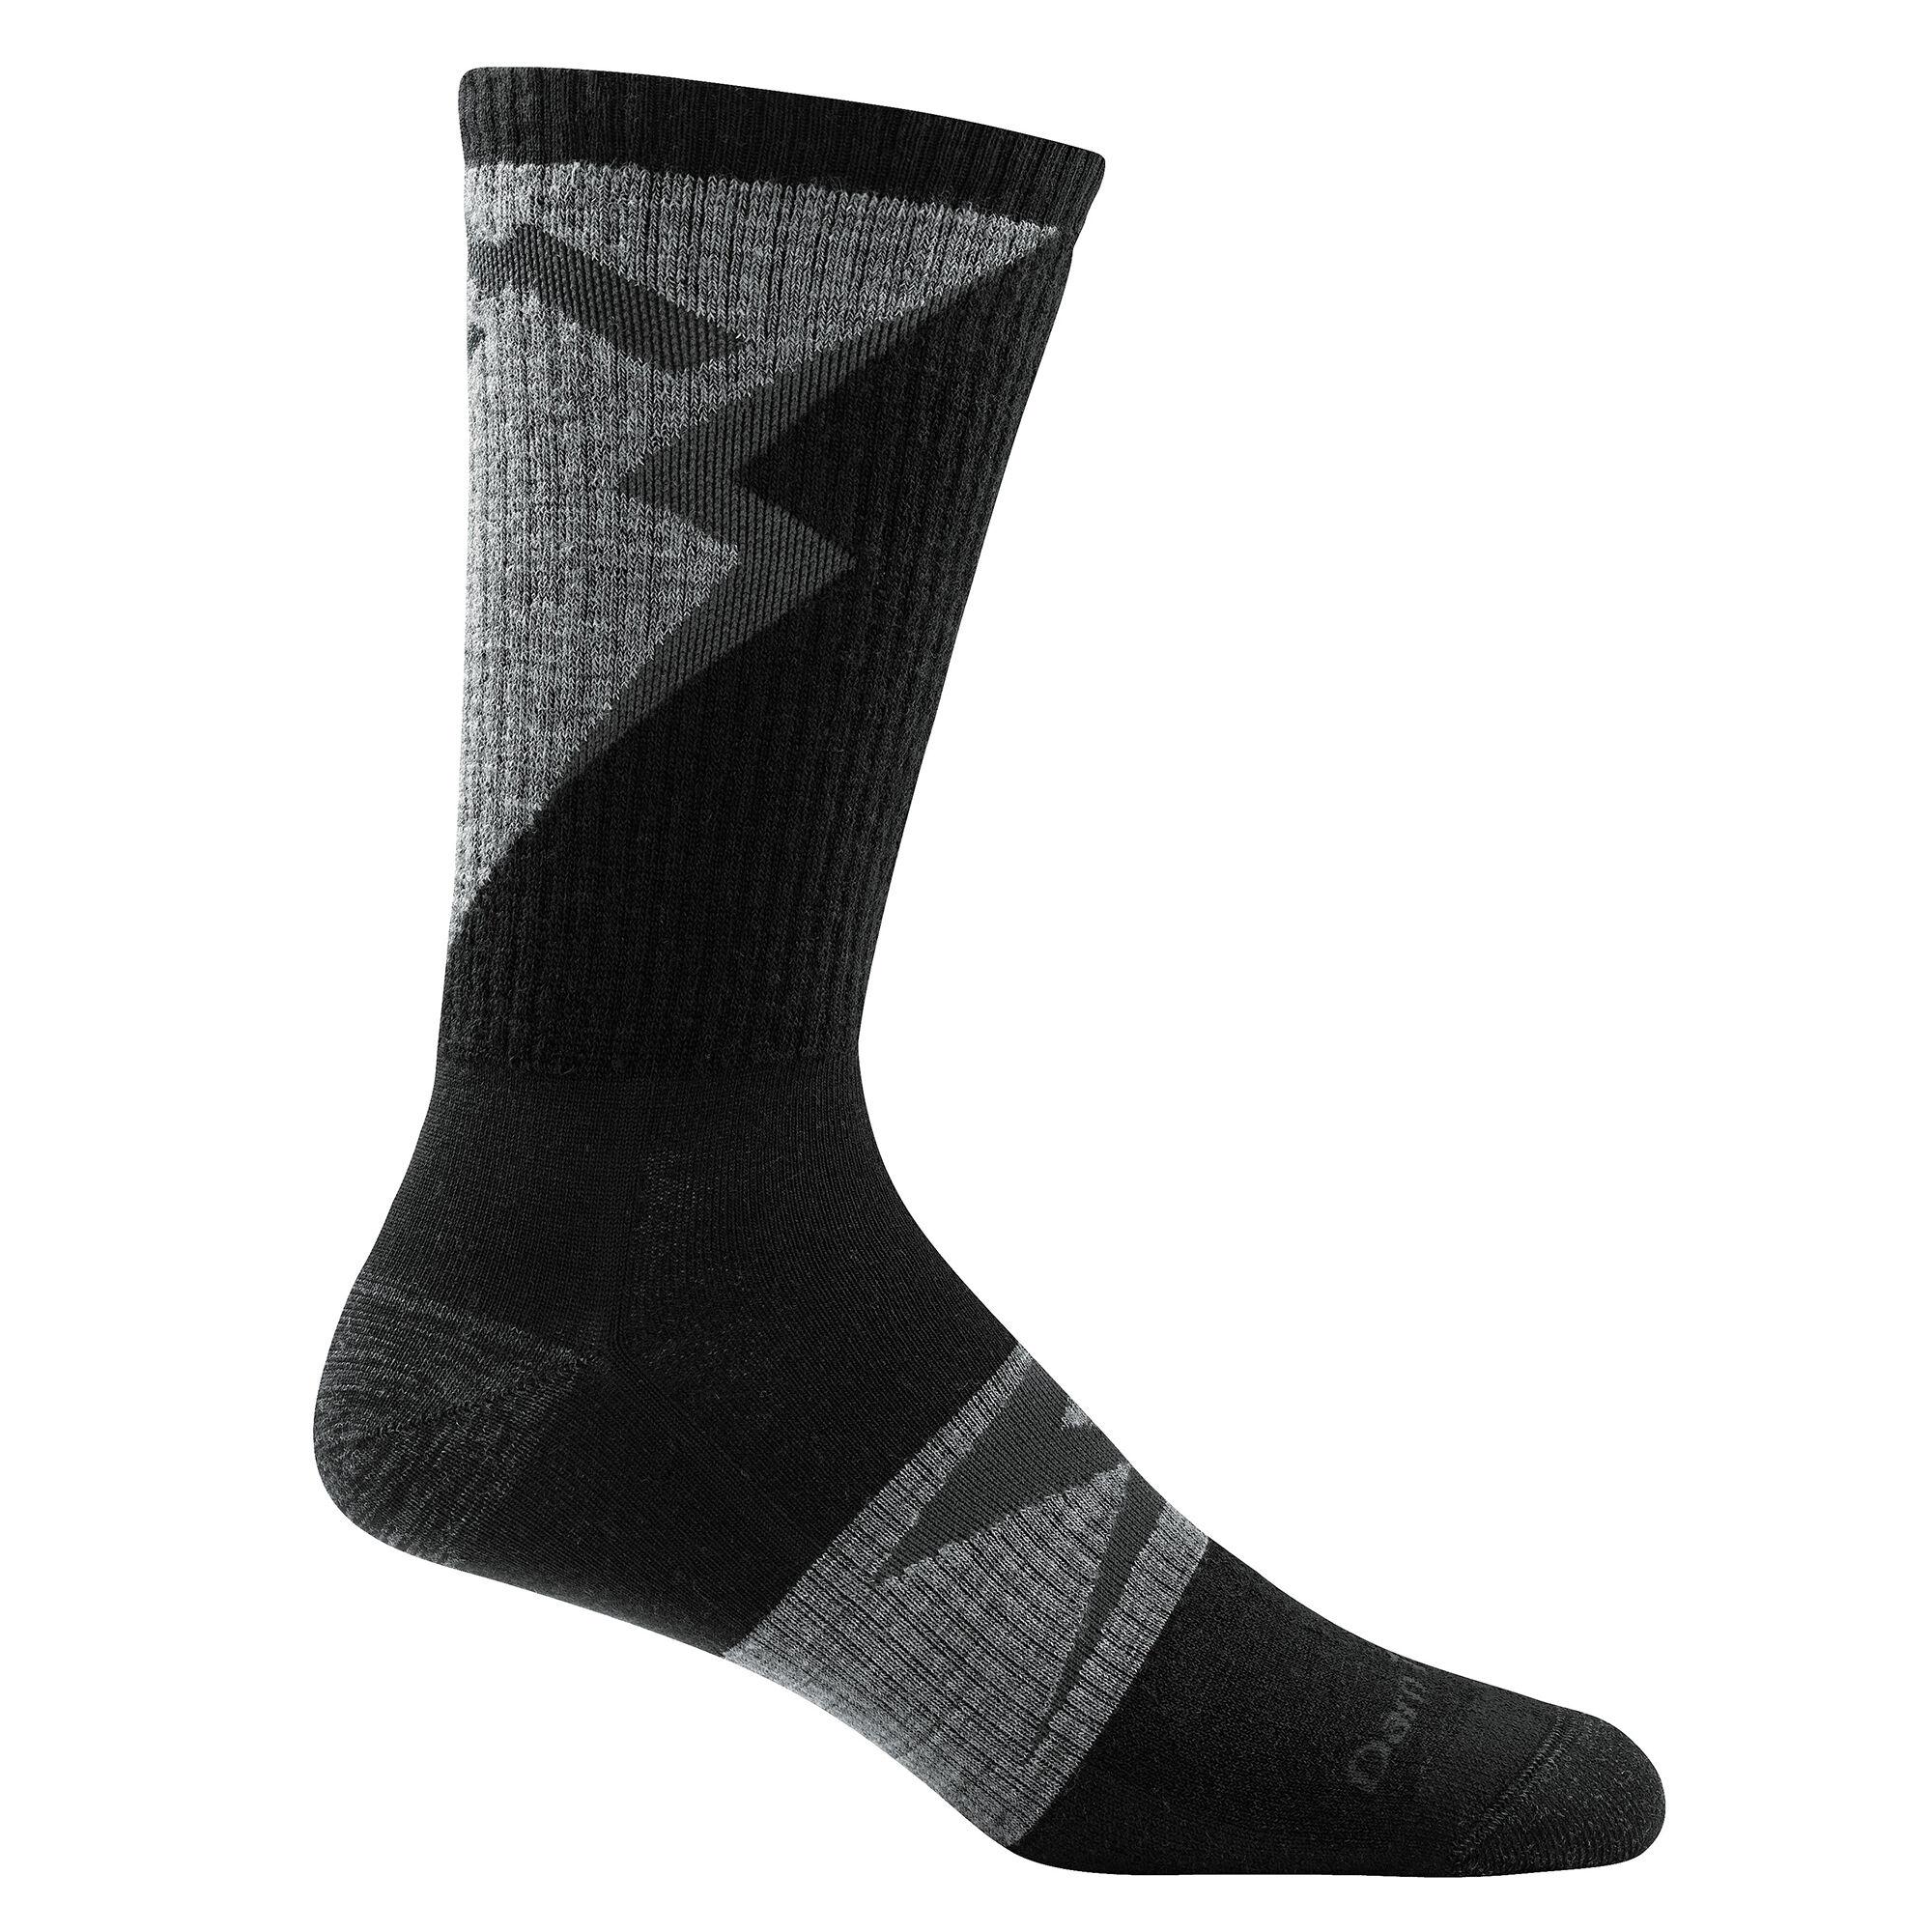 Darn Tough Sock Darn Tough Men's BA Barney Crew Sock